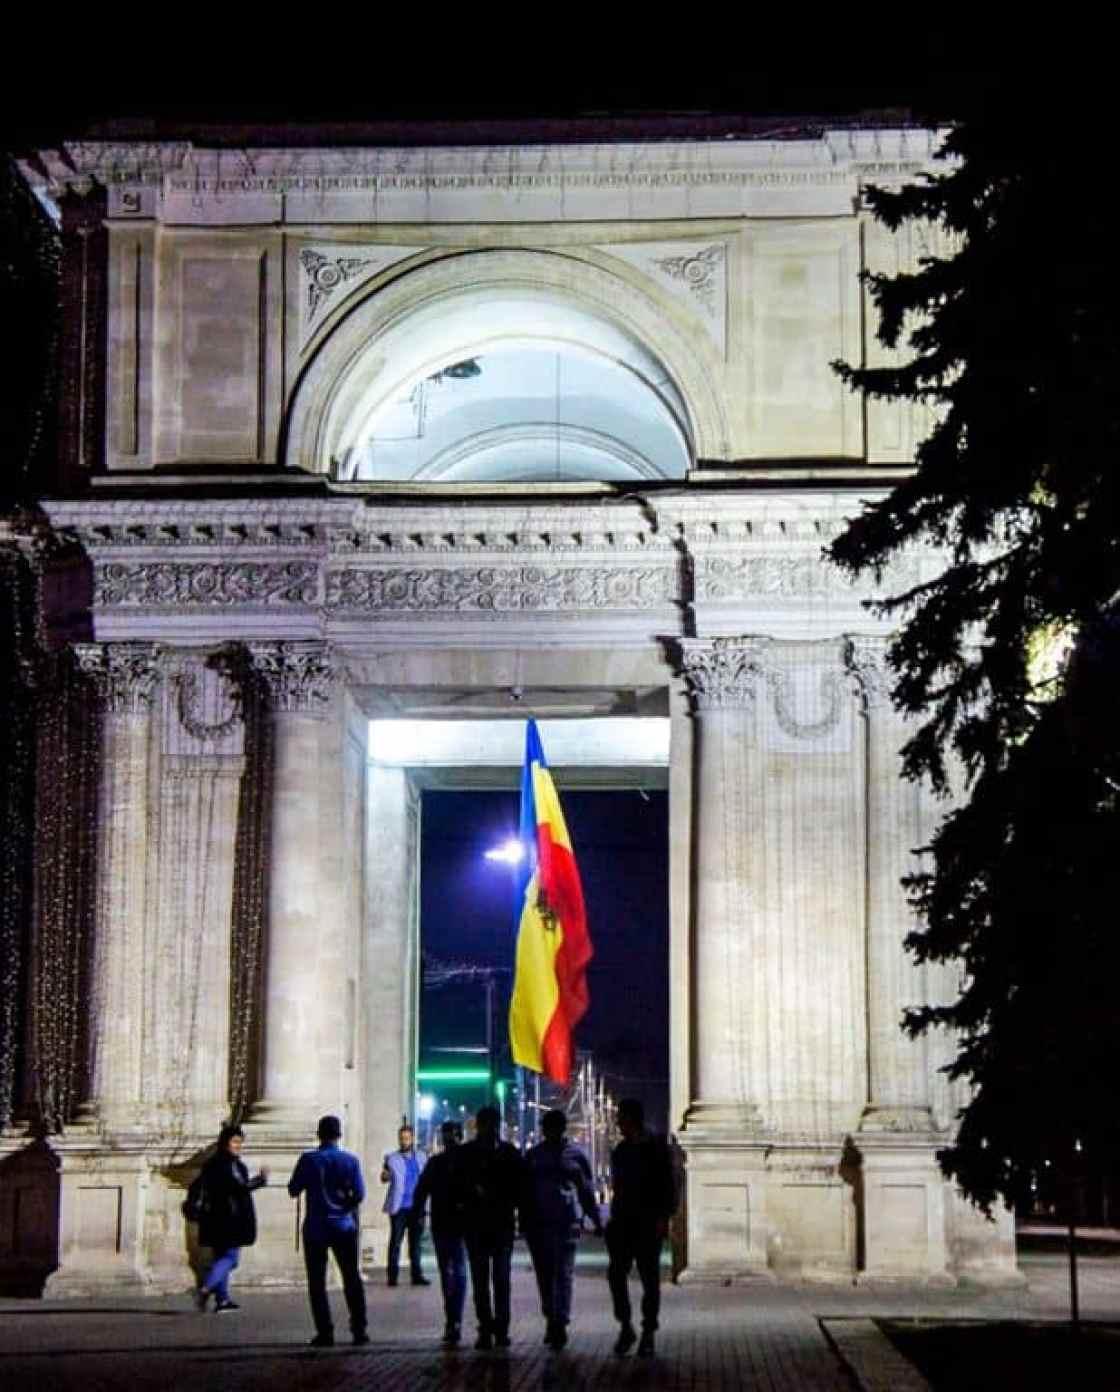 The Triumphal Arch in Chisinau